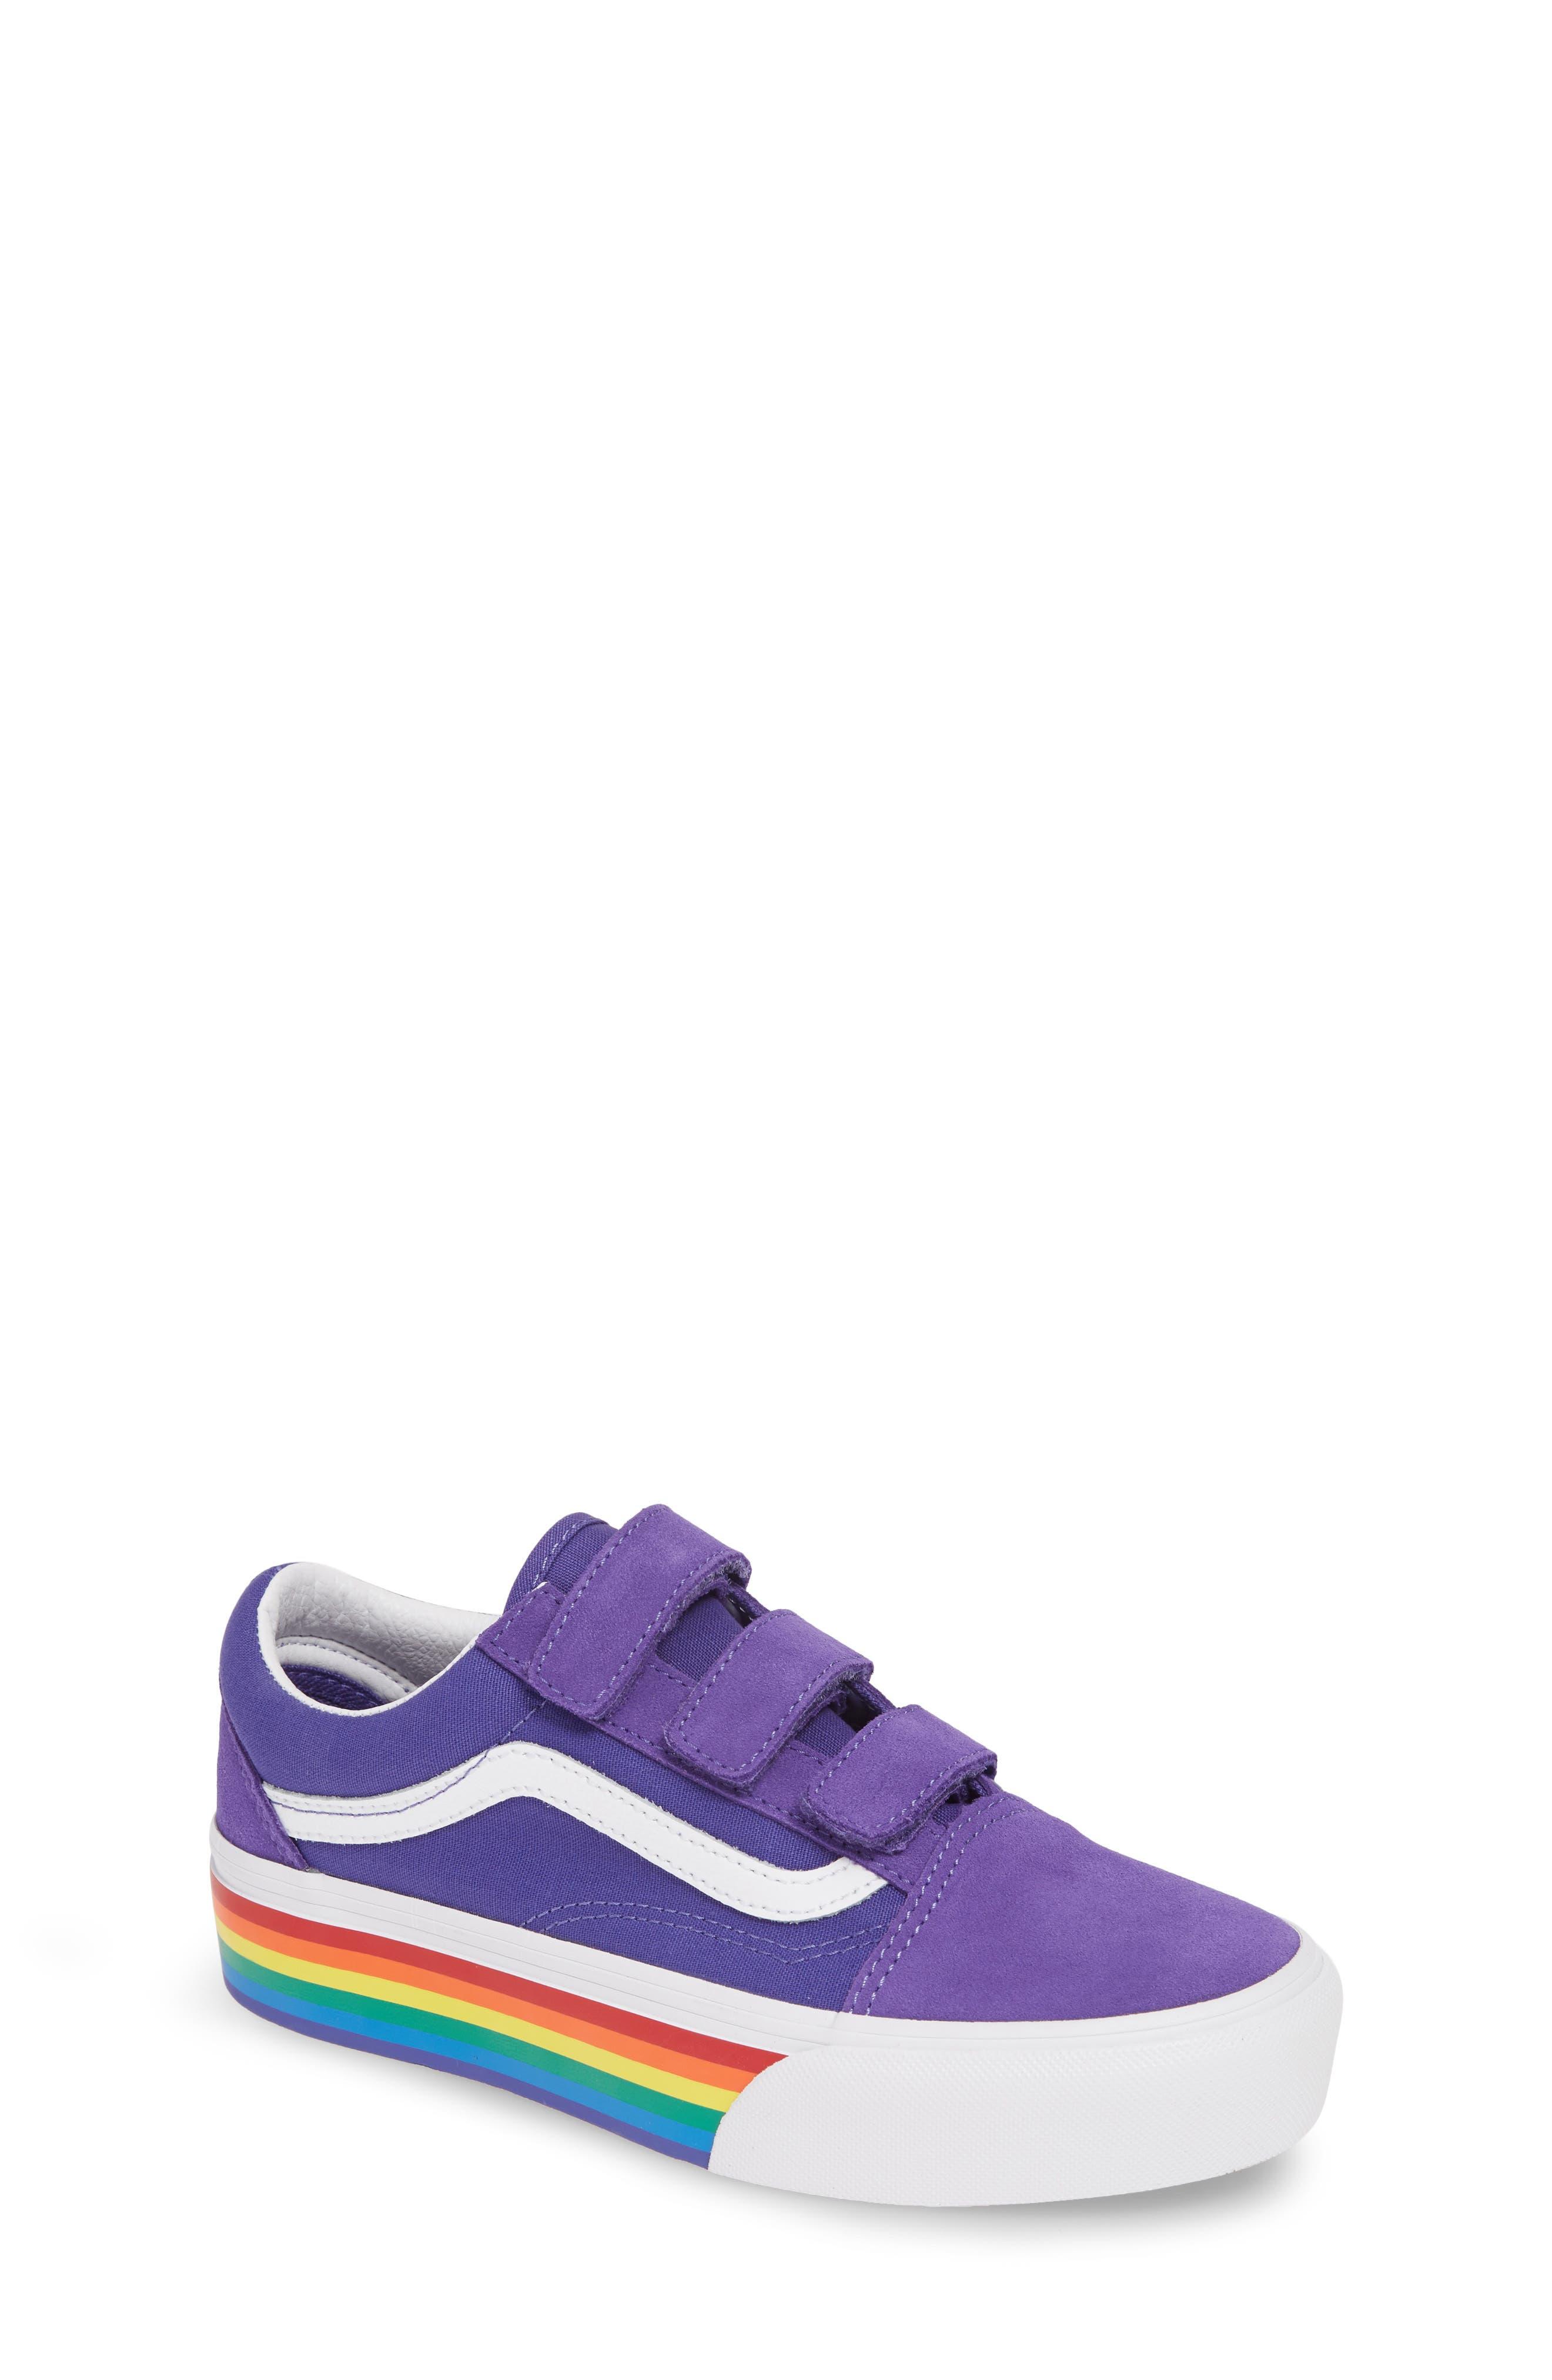 Girls Vans Old Skool V Rainbow Platform Sneaker Size 5 M  Purple